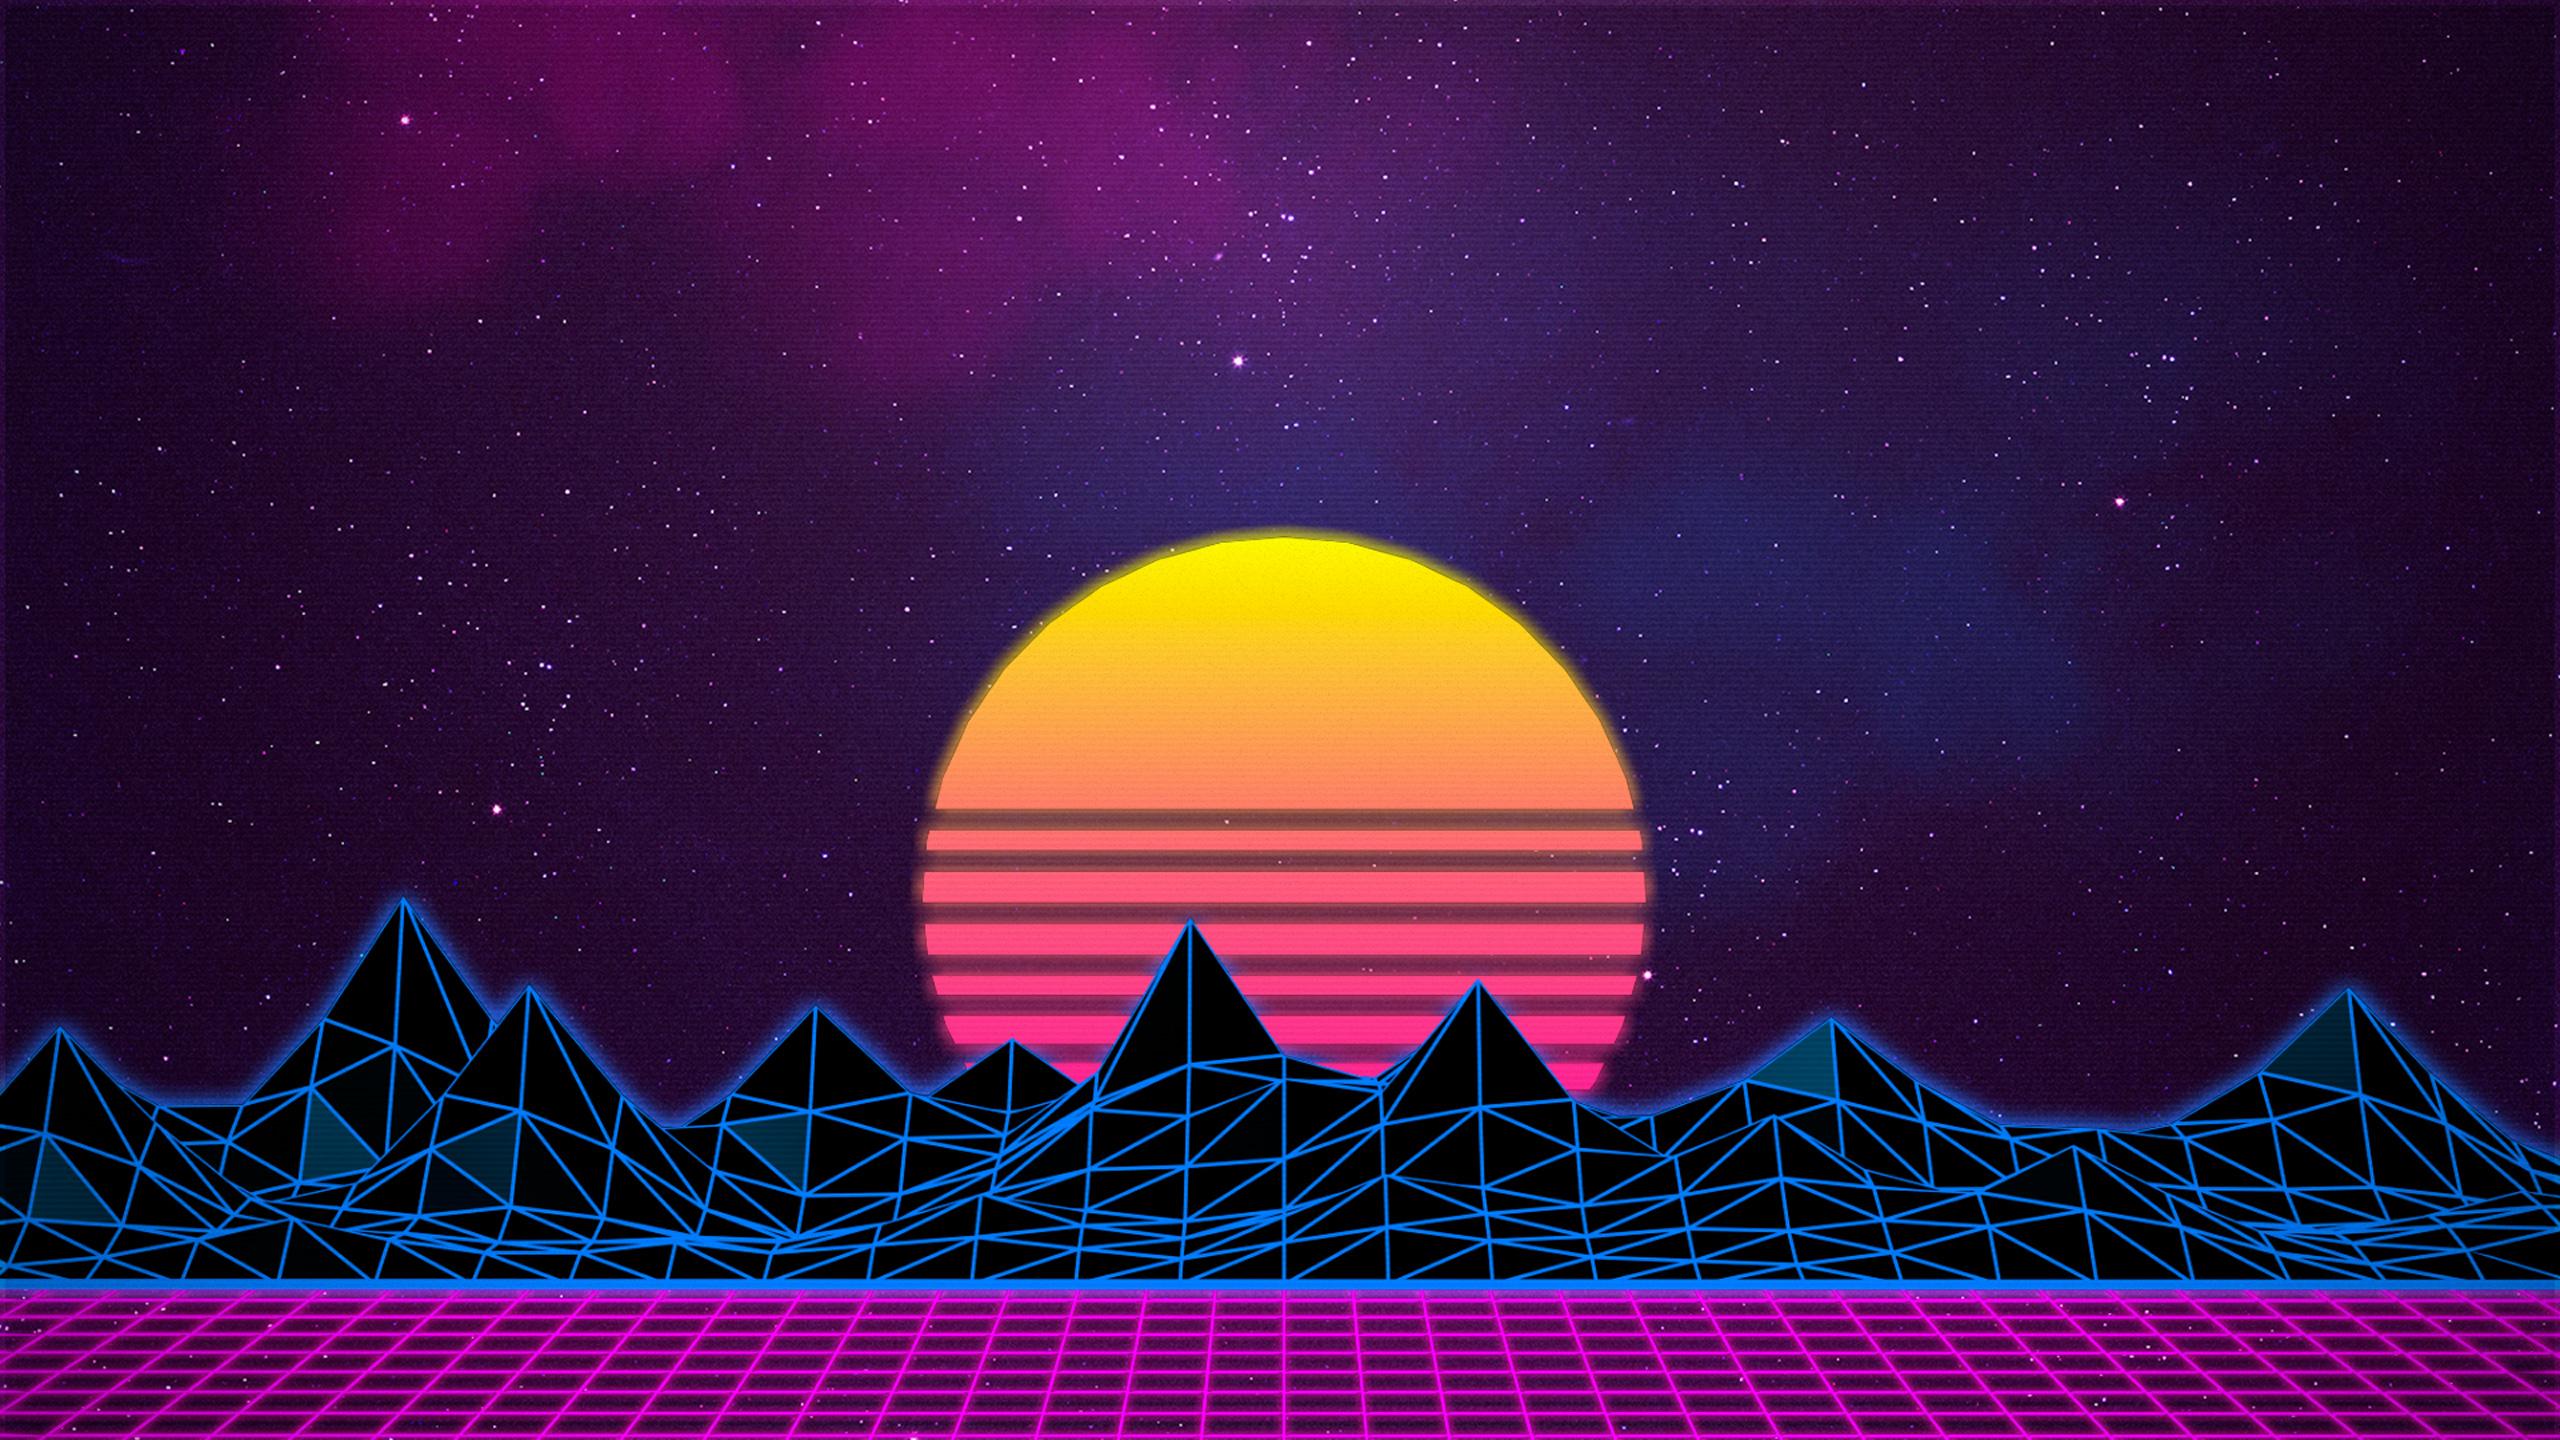 General 2560x1440 retrowave Retrowave purple purple background pink vaporwave abstract stars